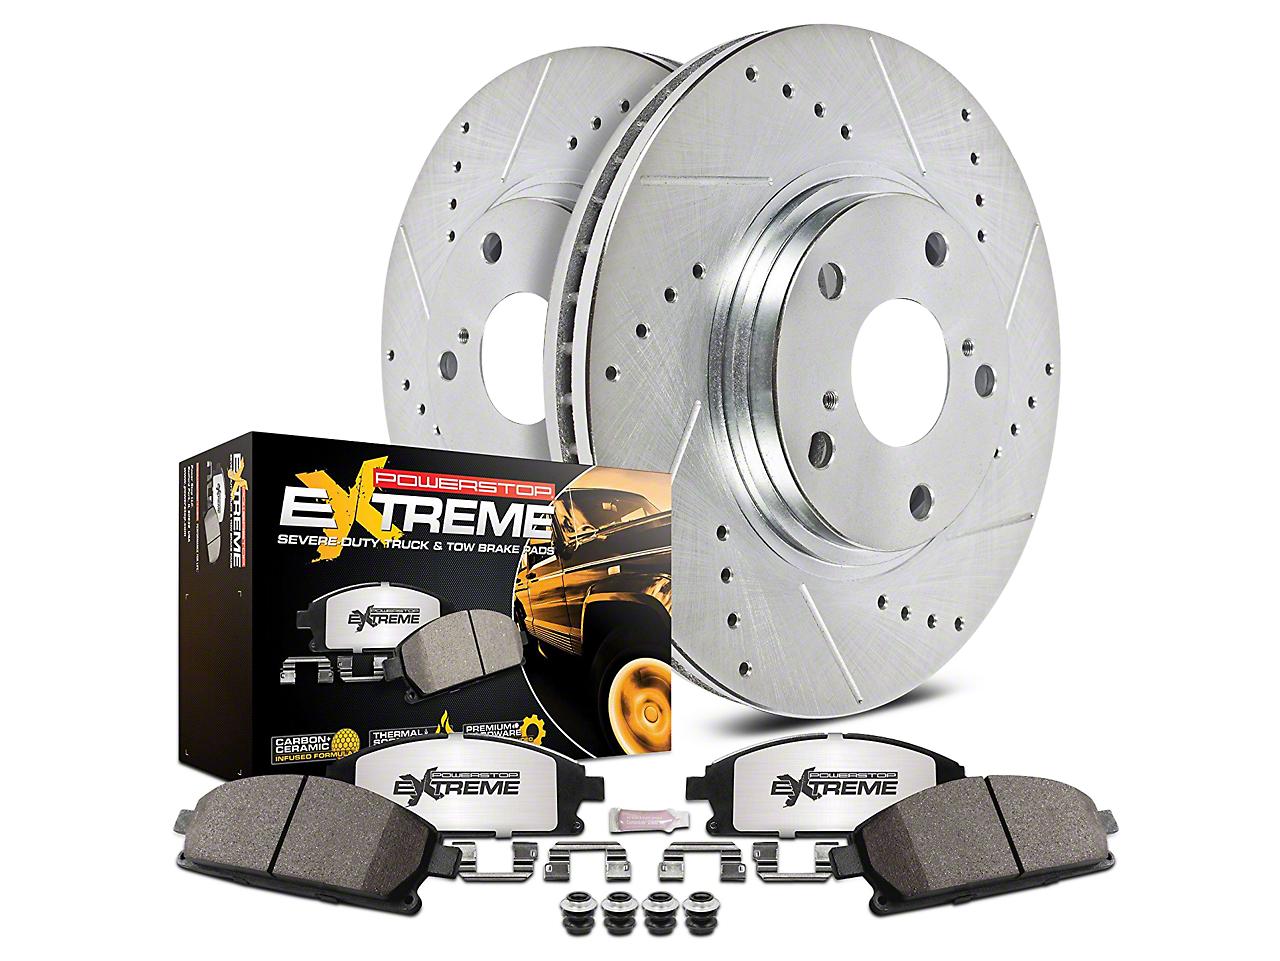 Power Stop Z36 Extreme Truck & Tow Brake Rotor & Pad Kit - Rear (07-13 Silverado 1500 w/ Rear Disc Brakes)